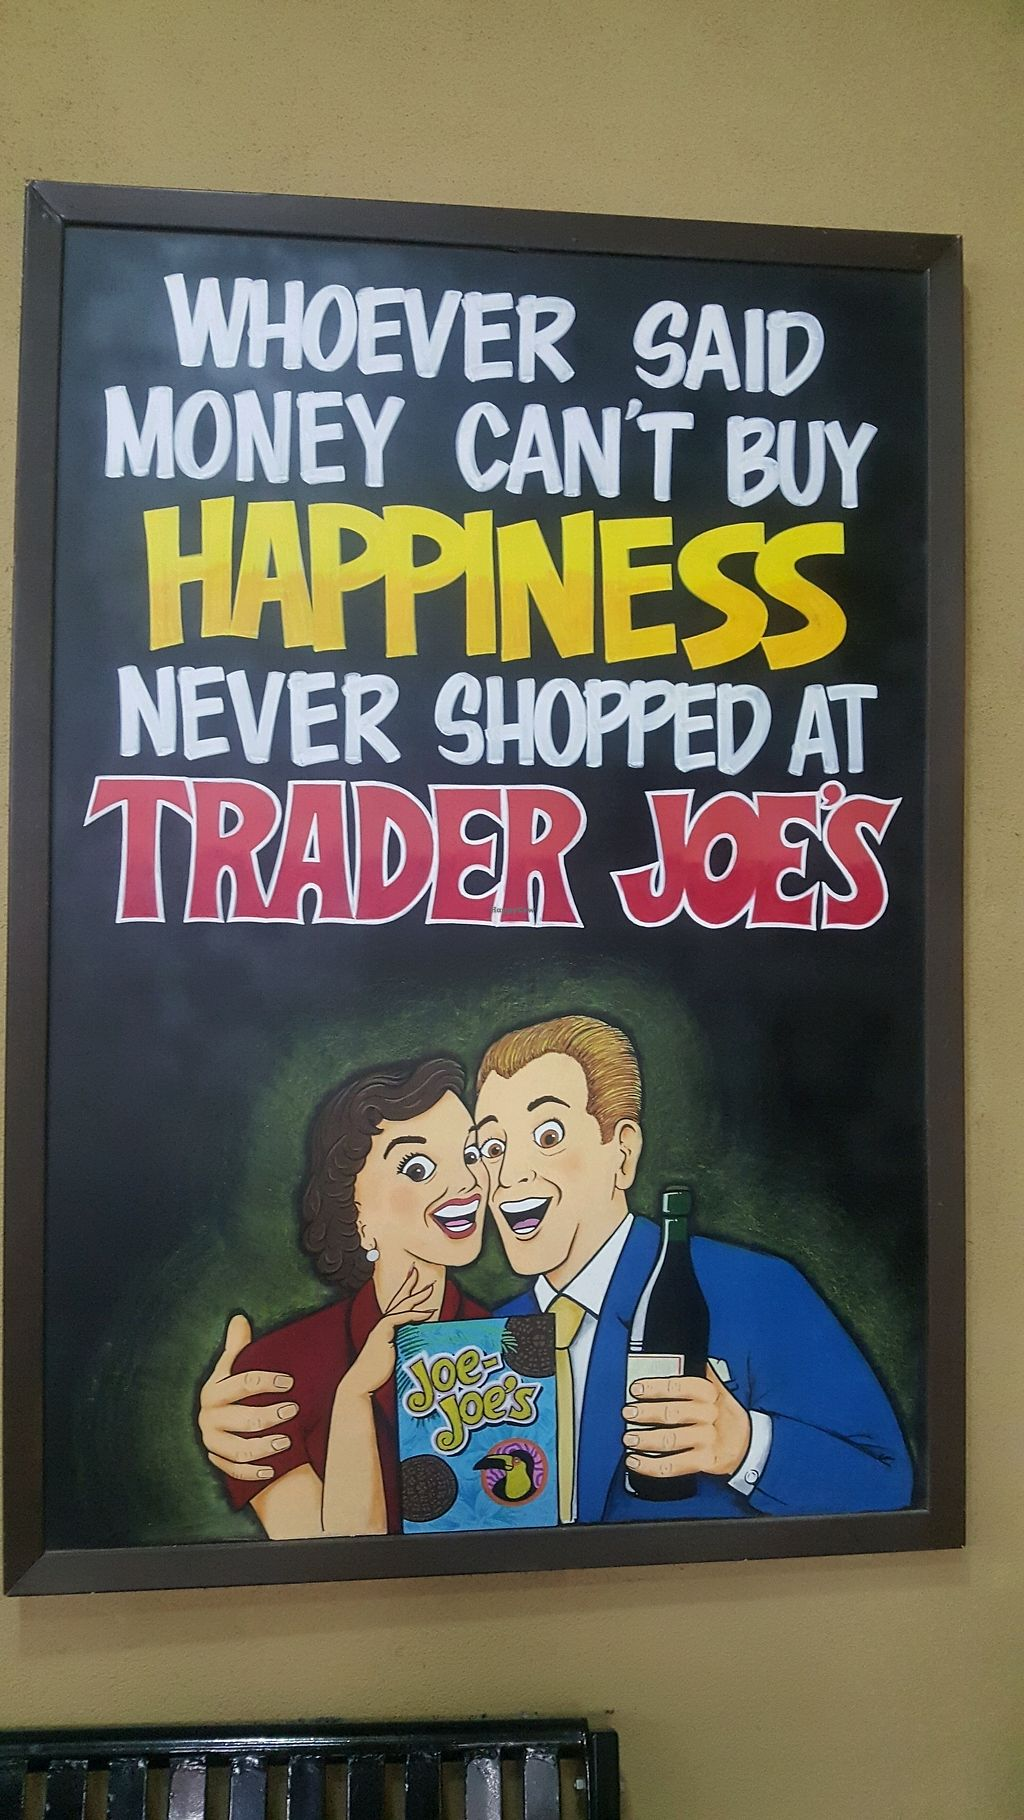 "Photo of Trader Joe's  by <a href=""/members/profile/VegManda"">VegManda</a> <br/>True <br/> September 25, 2017  - <a href='/contact/abuse/image/20167/308112'>Report</a>"